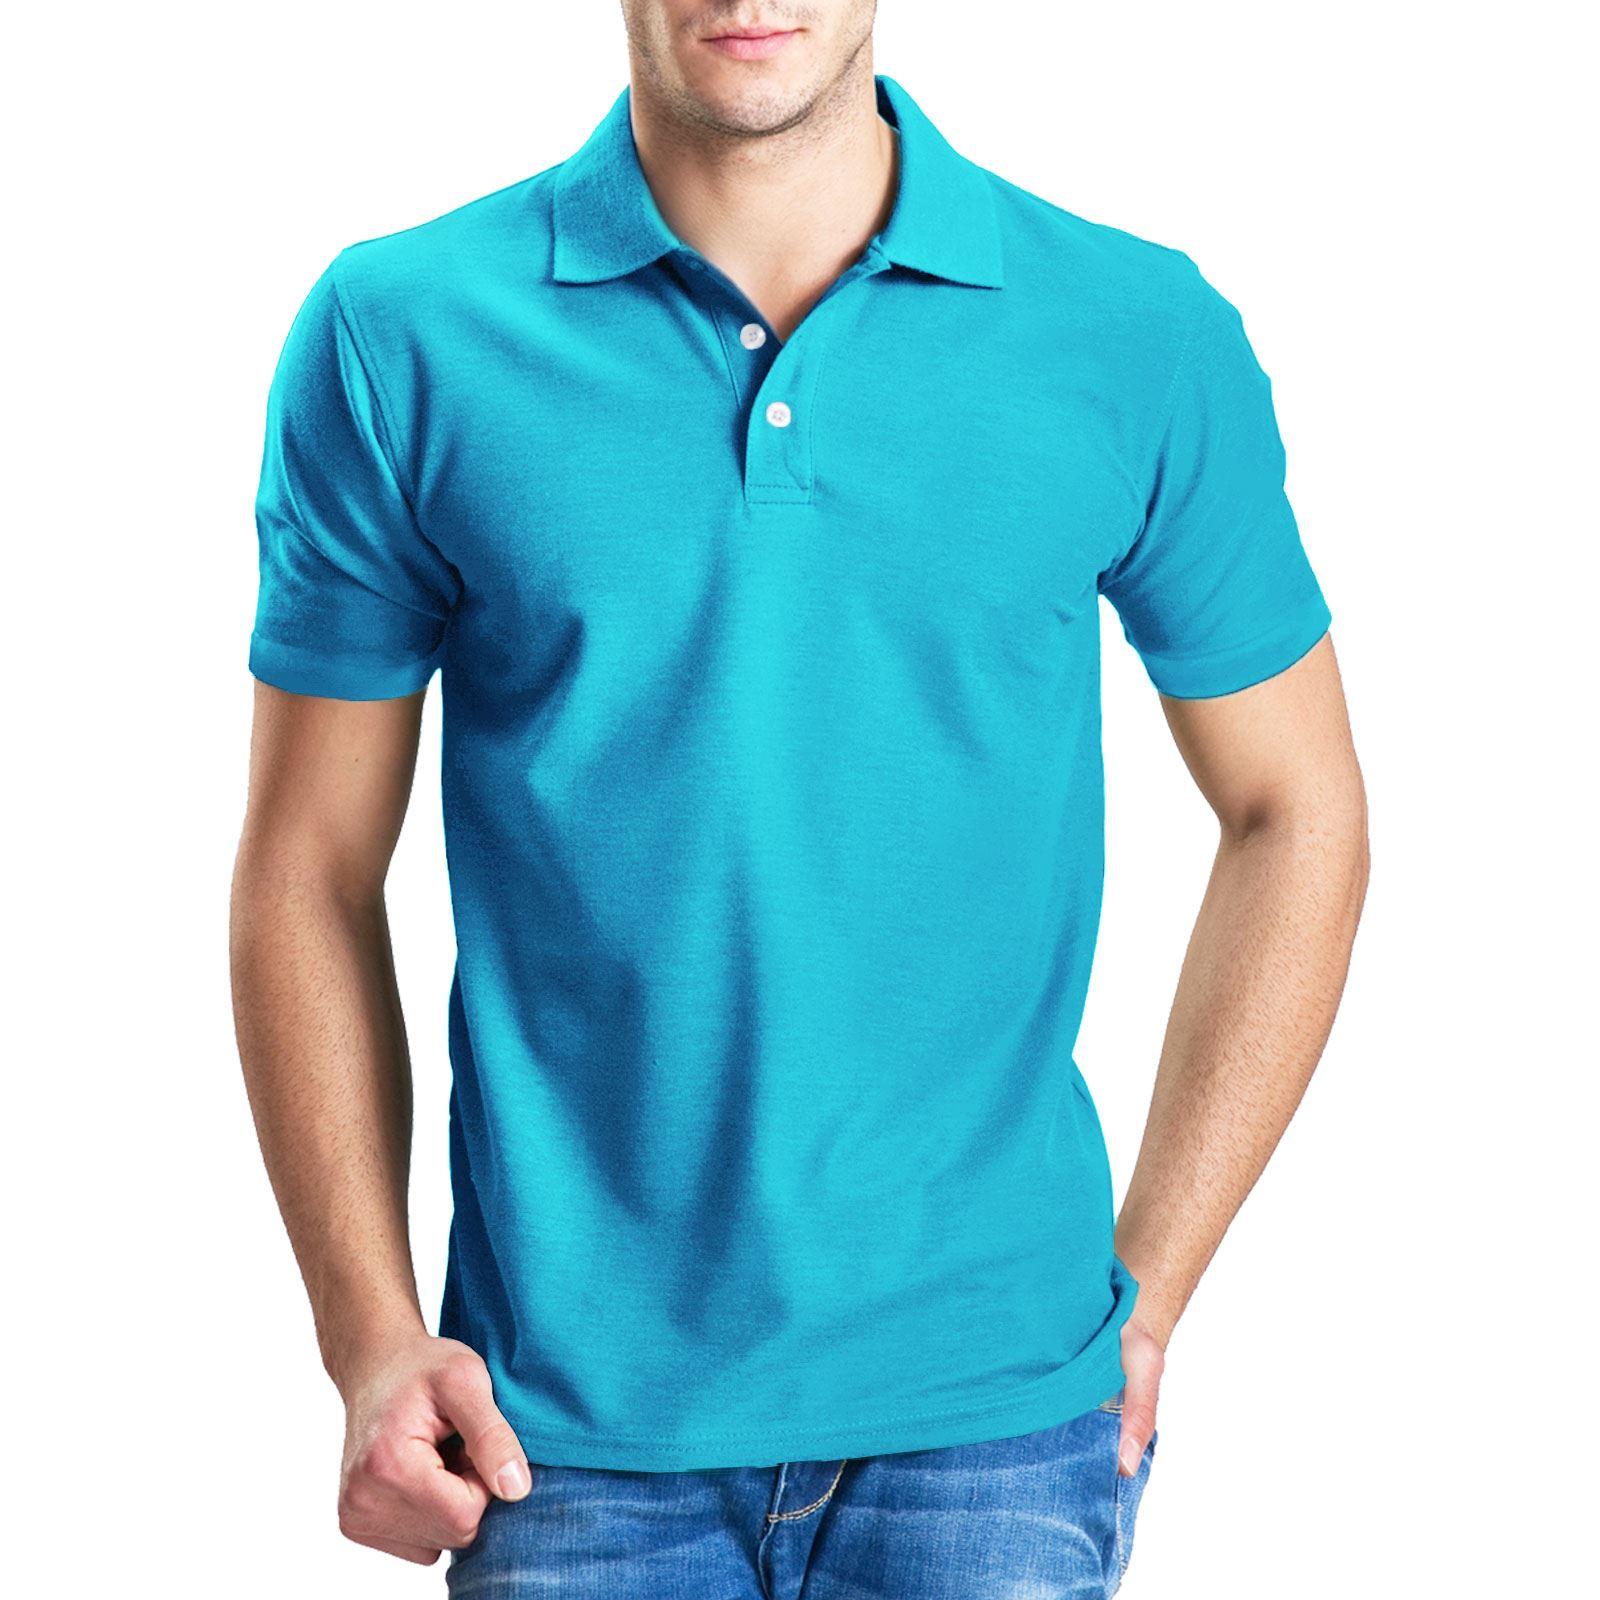 Mens polo shirt striped short sleeve top golf tennis t for Xxl mens polo shirts